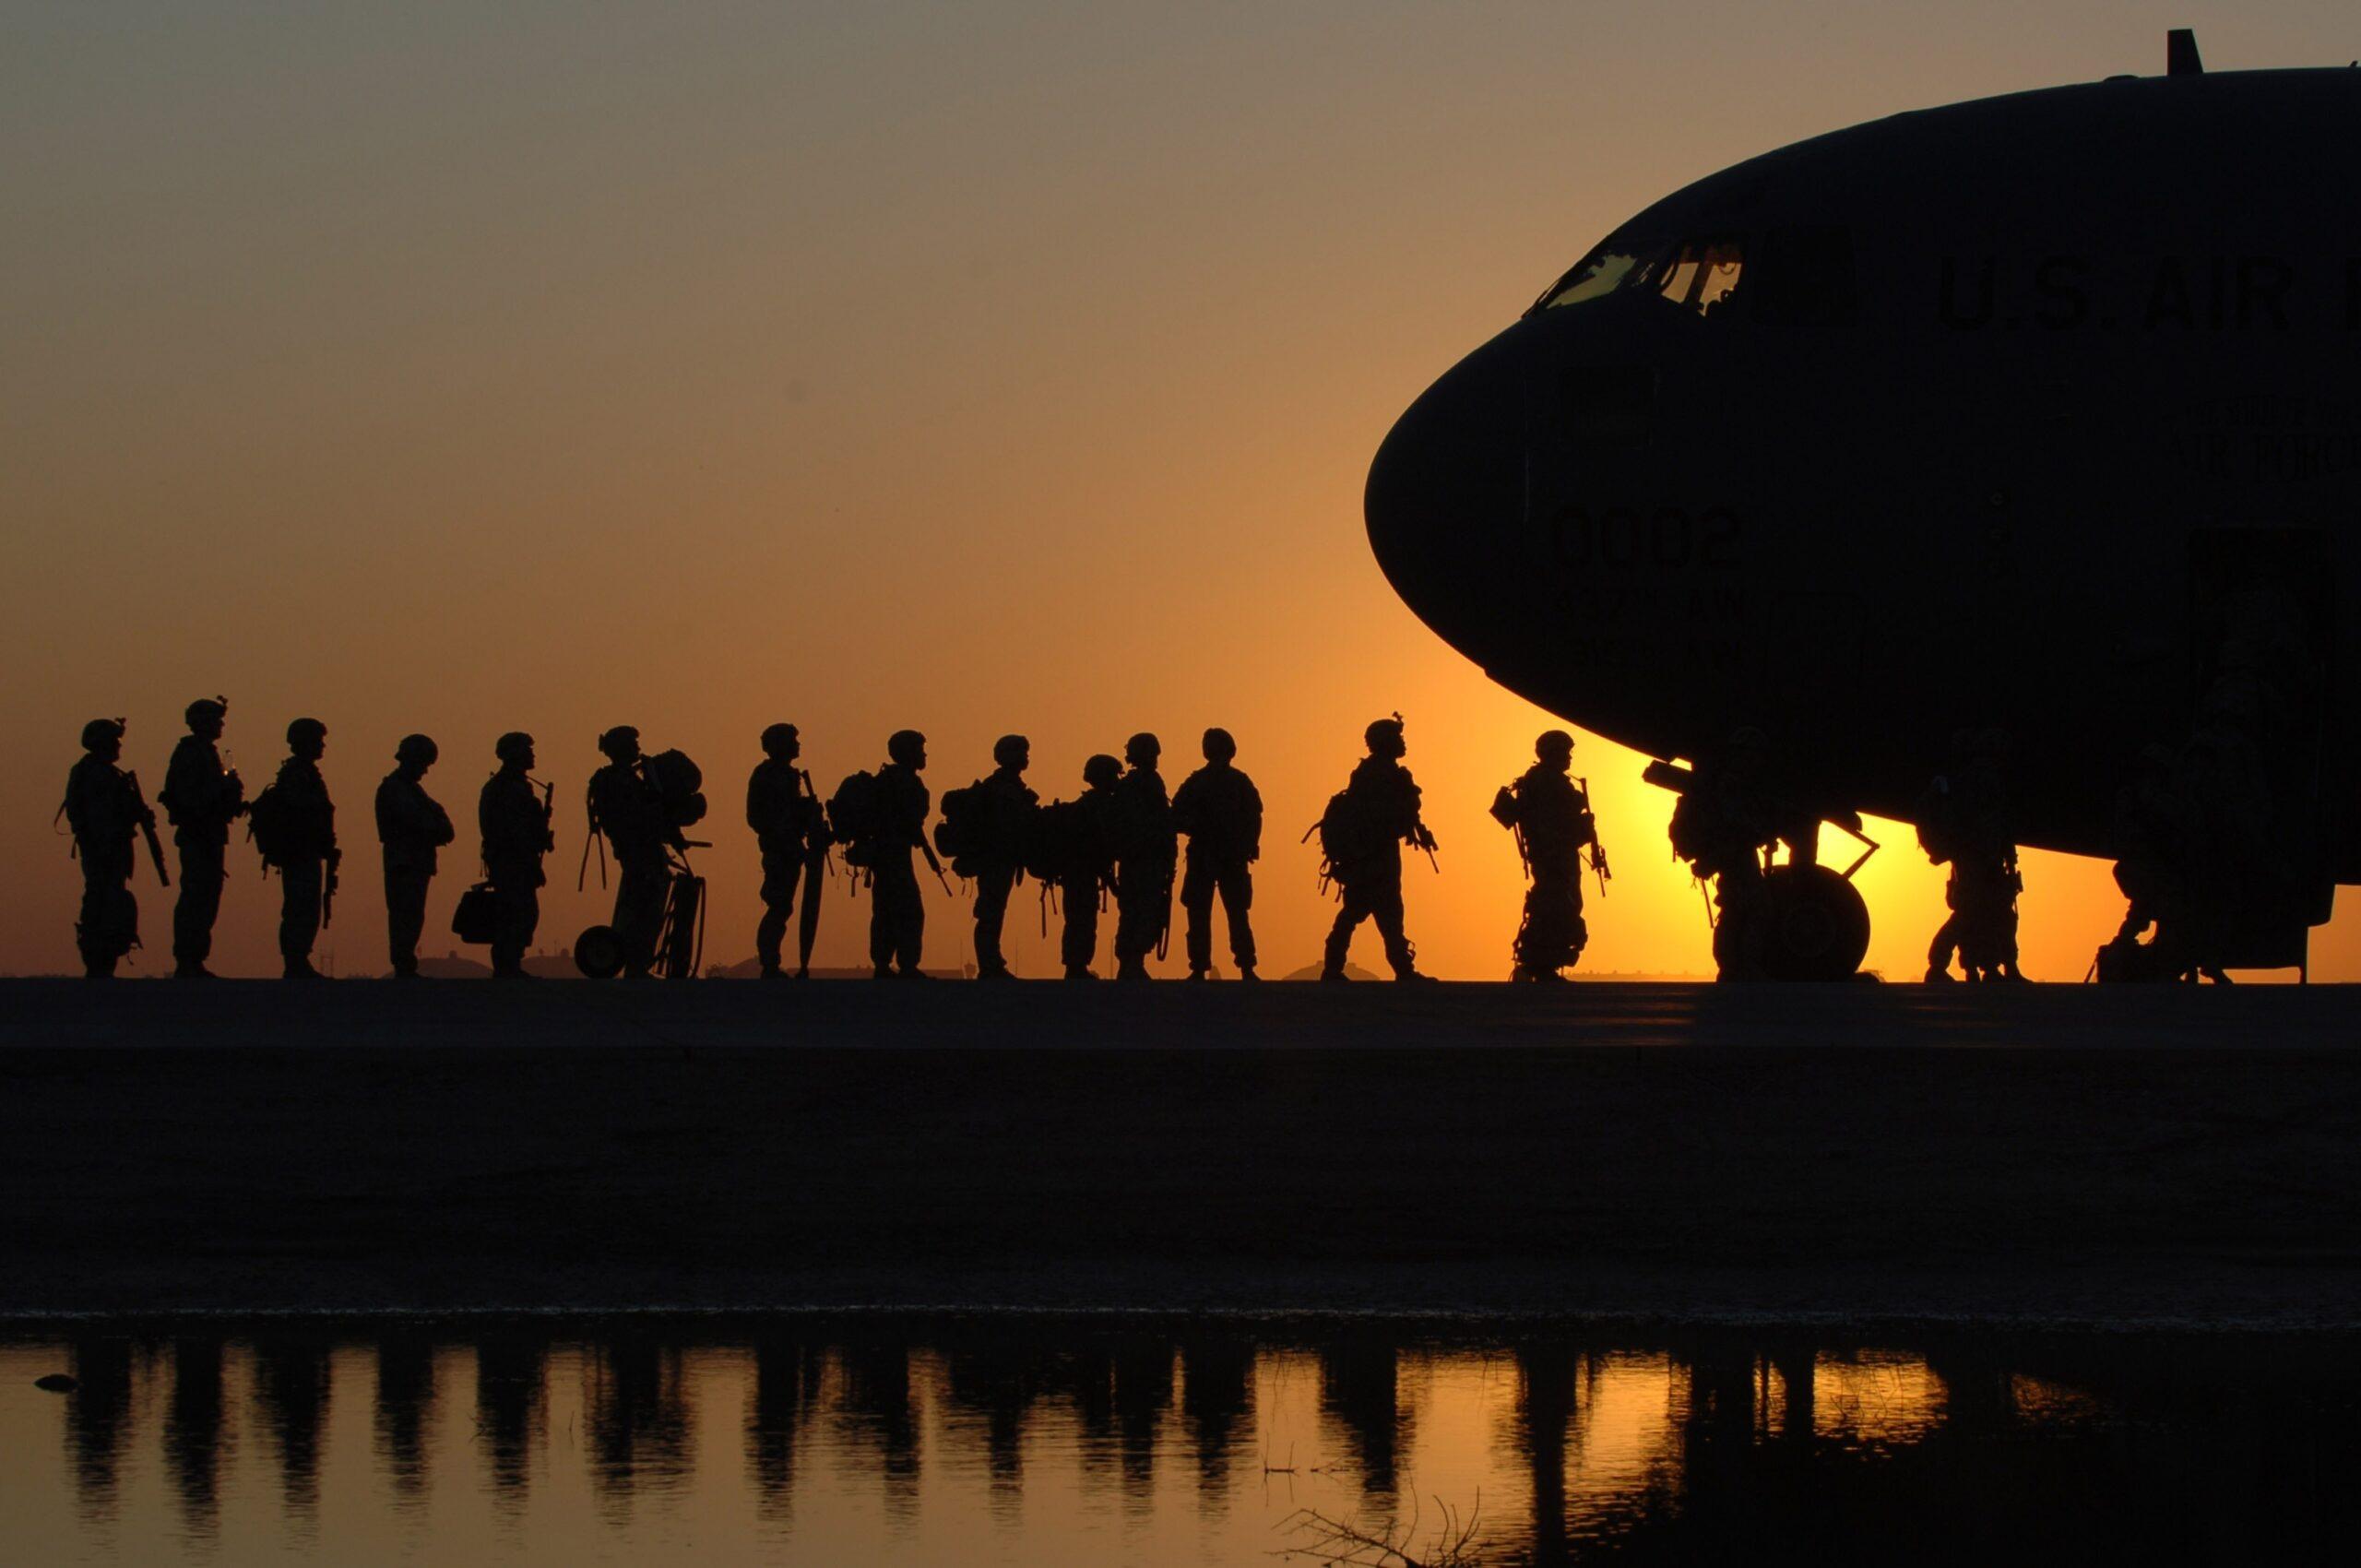 Military Training at Sunset